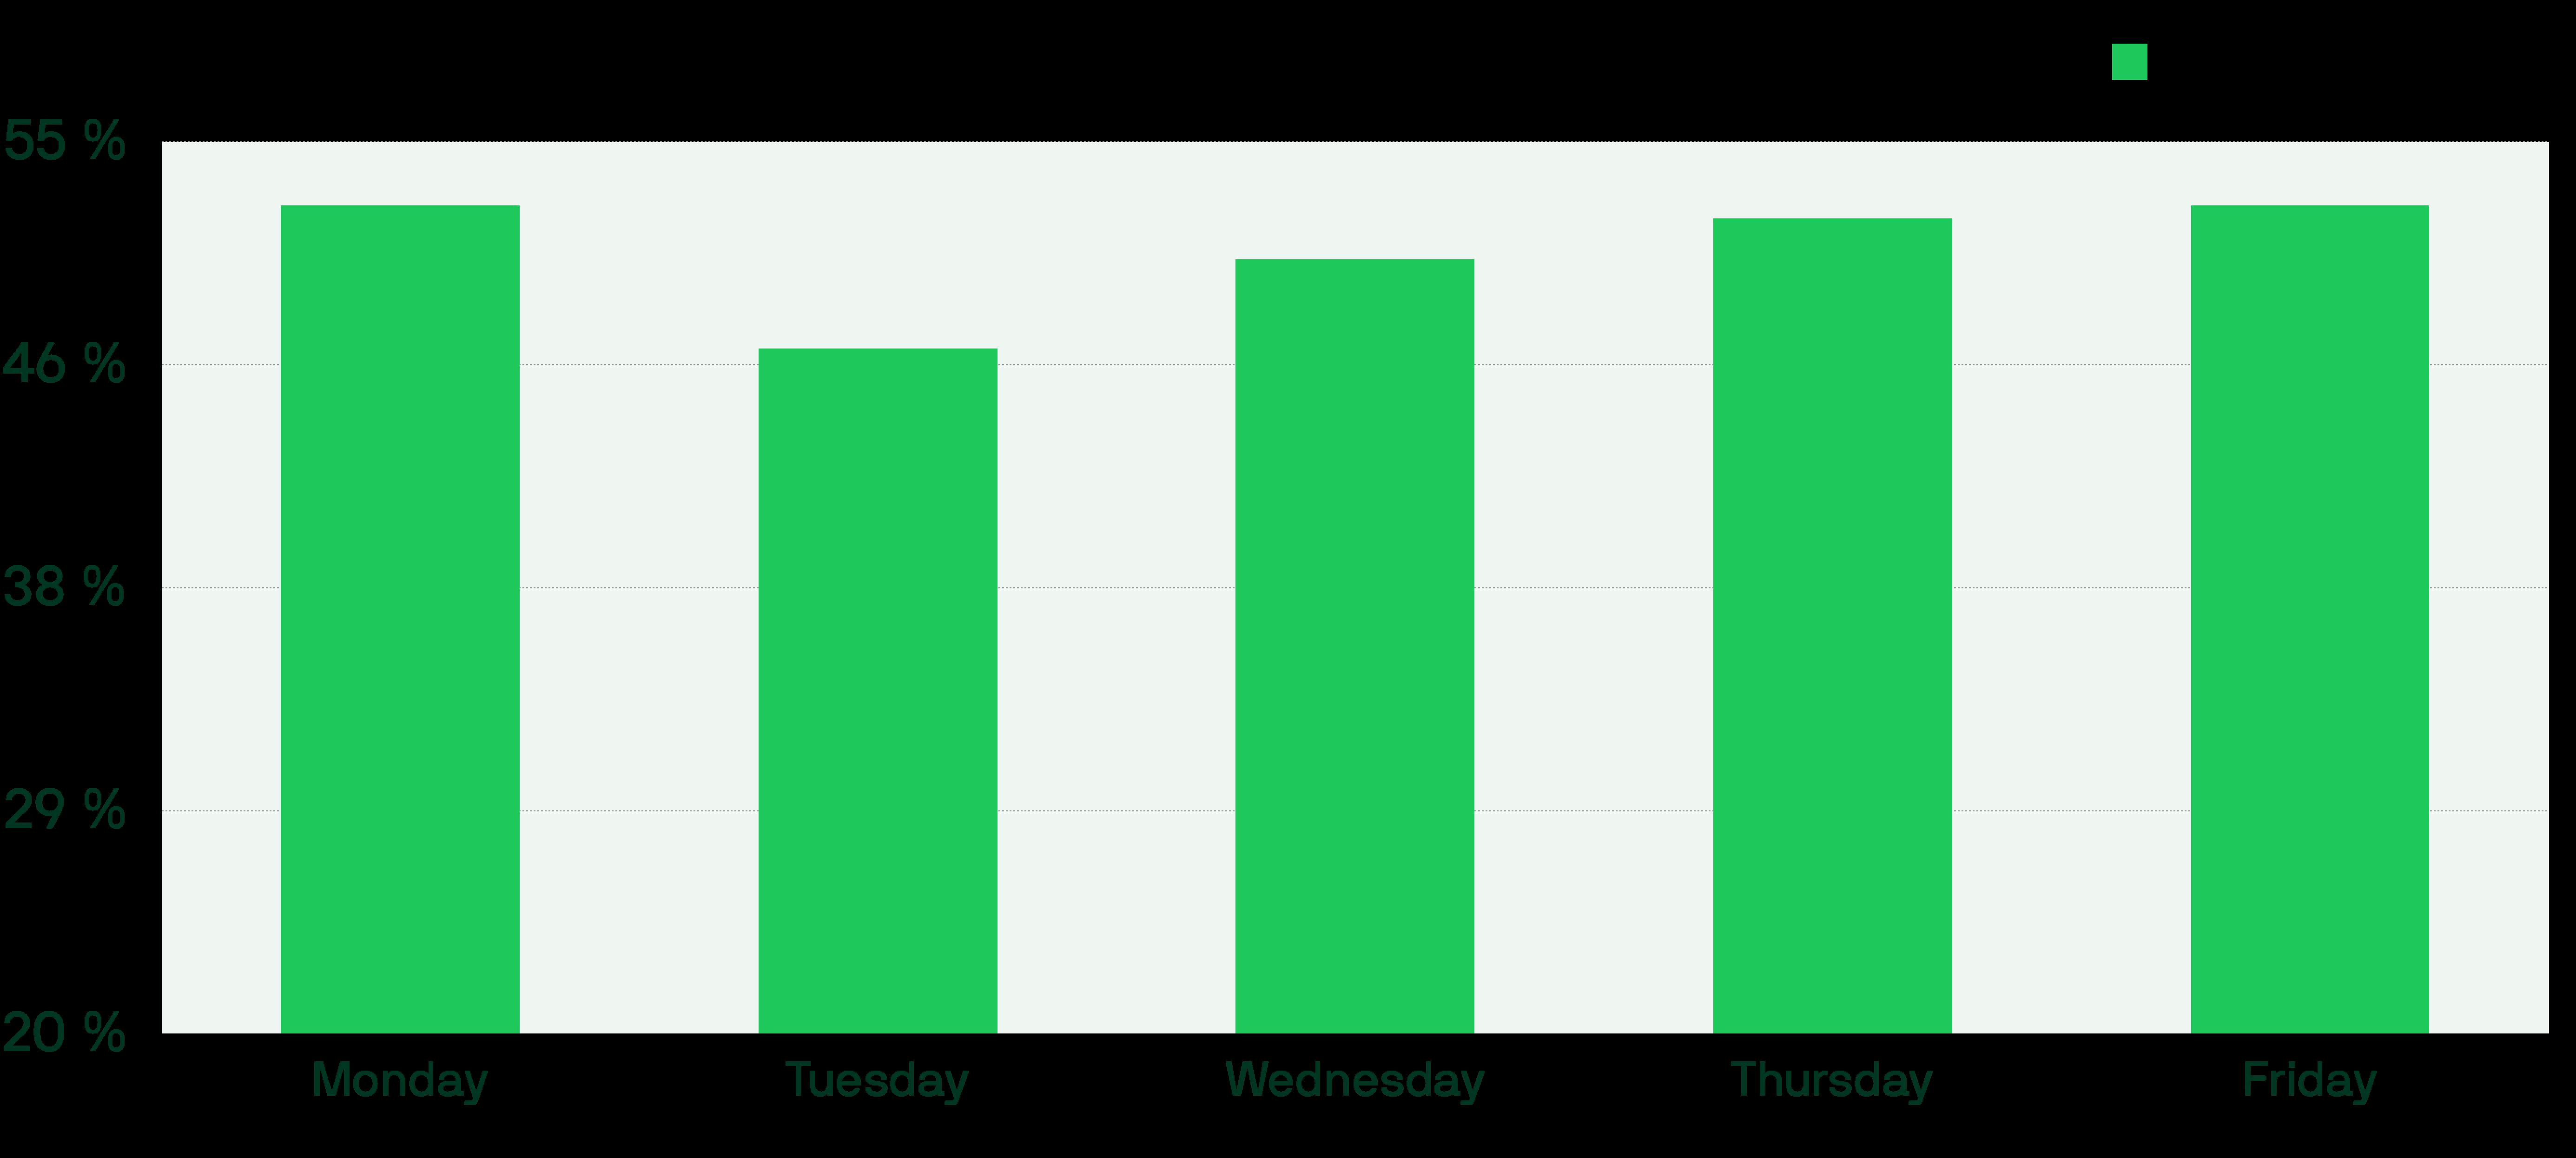 Webinar conversion rates per weekday